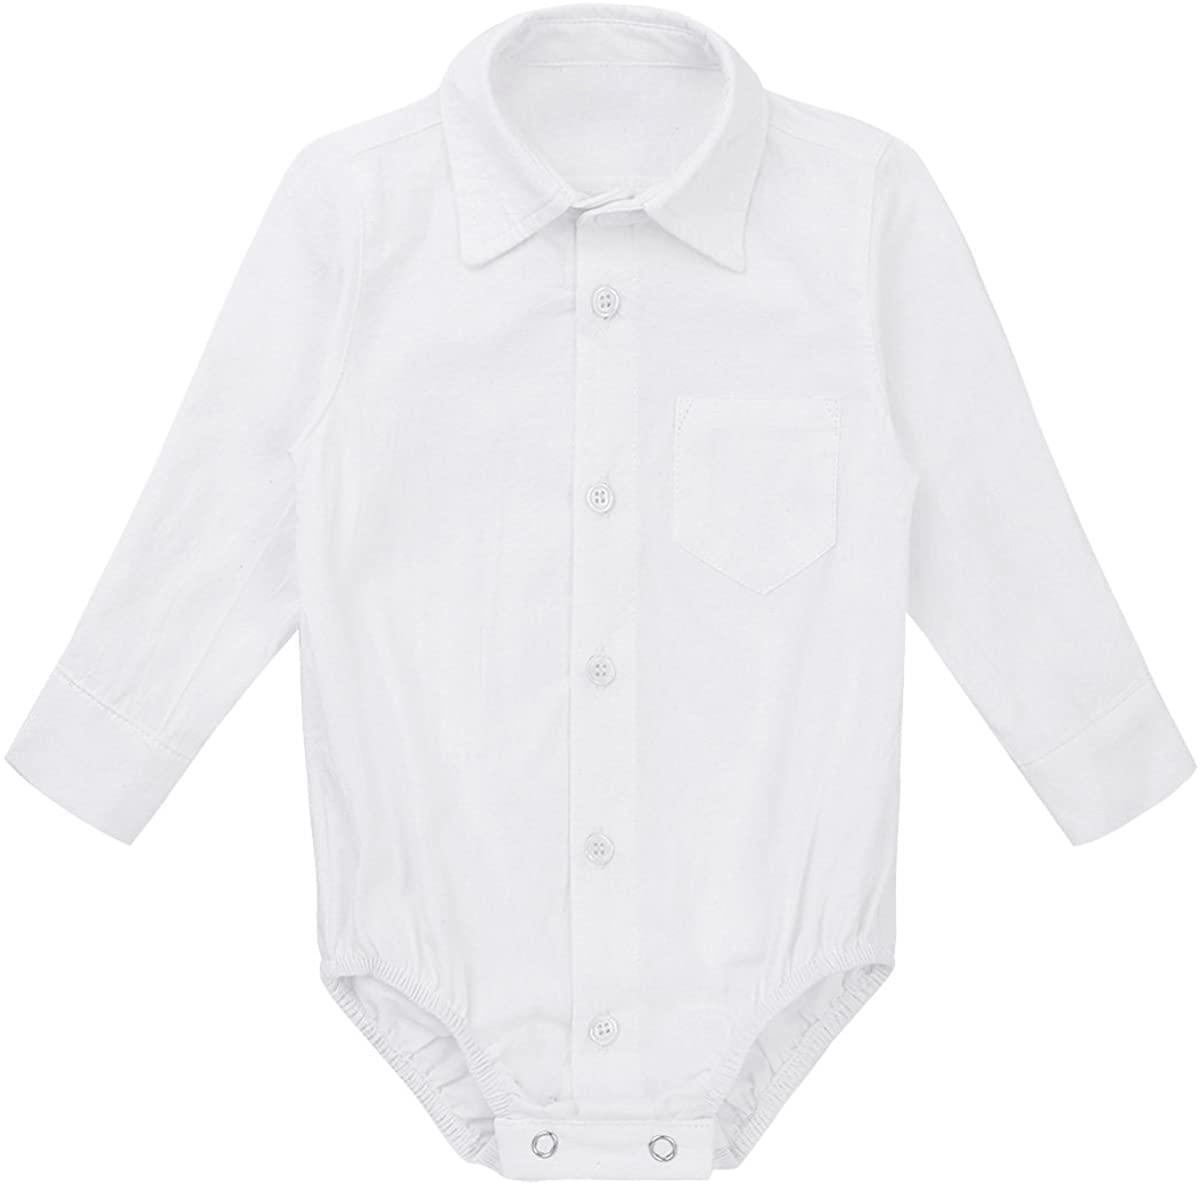 Agoky Infant Baby Boys' Gentleman Romper Formal Wedding Shirt Bodysuit Outfits